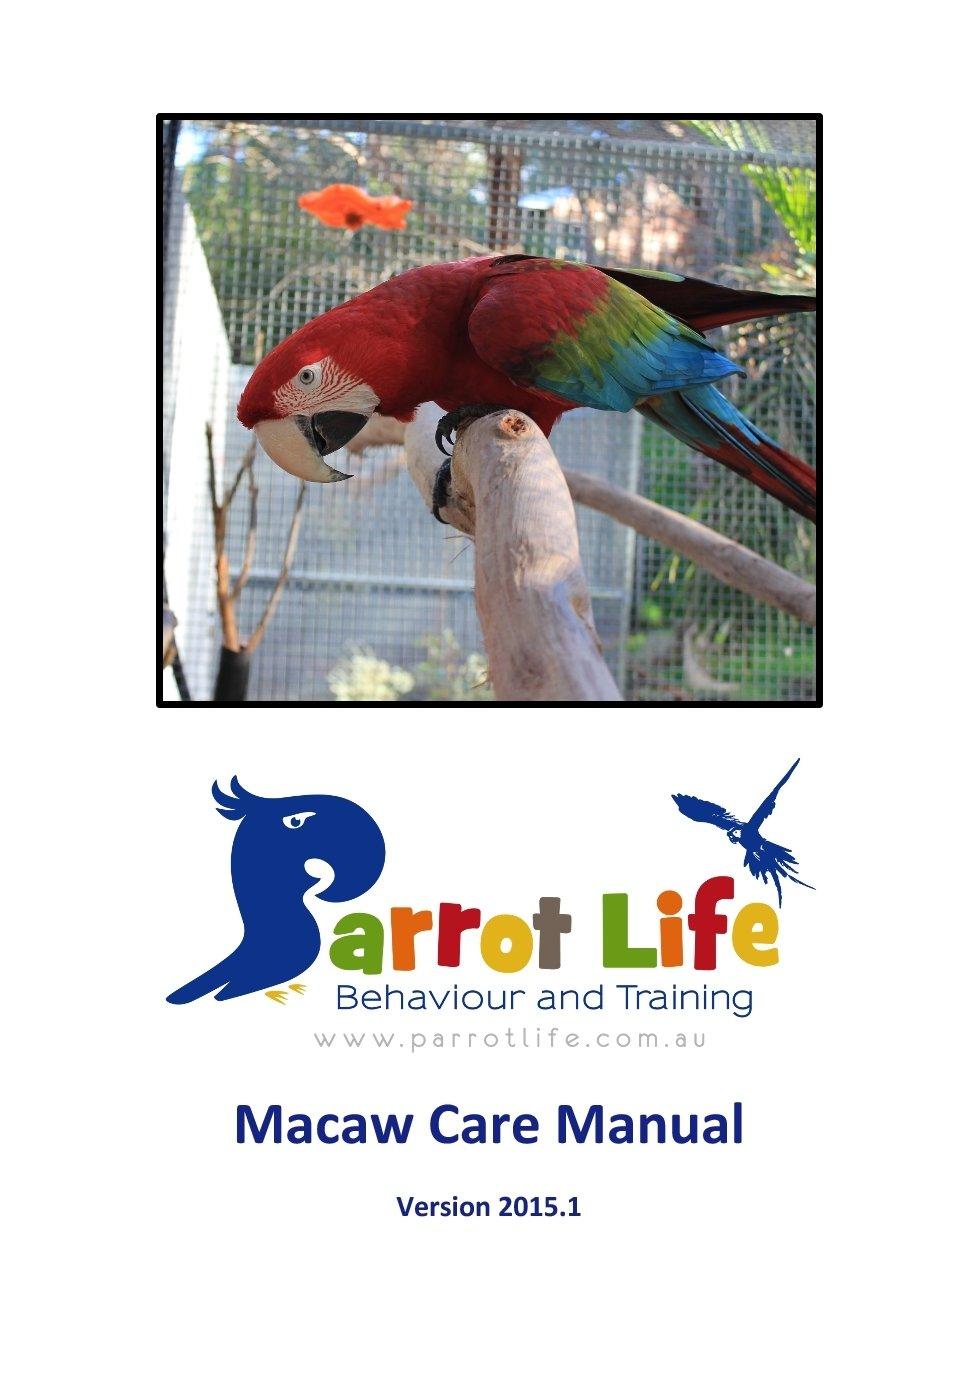 Parrot Life® Macaw Care Manual